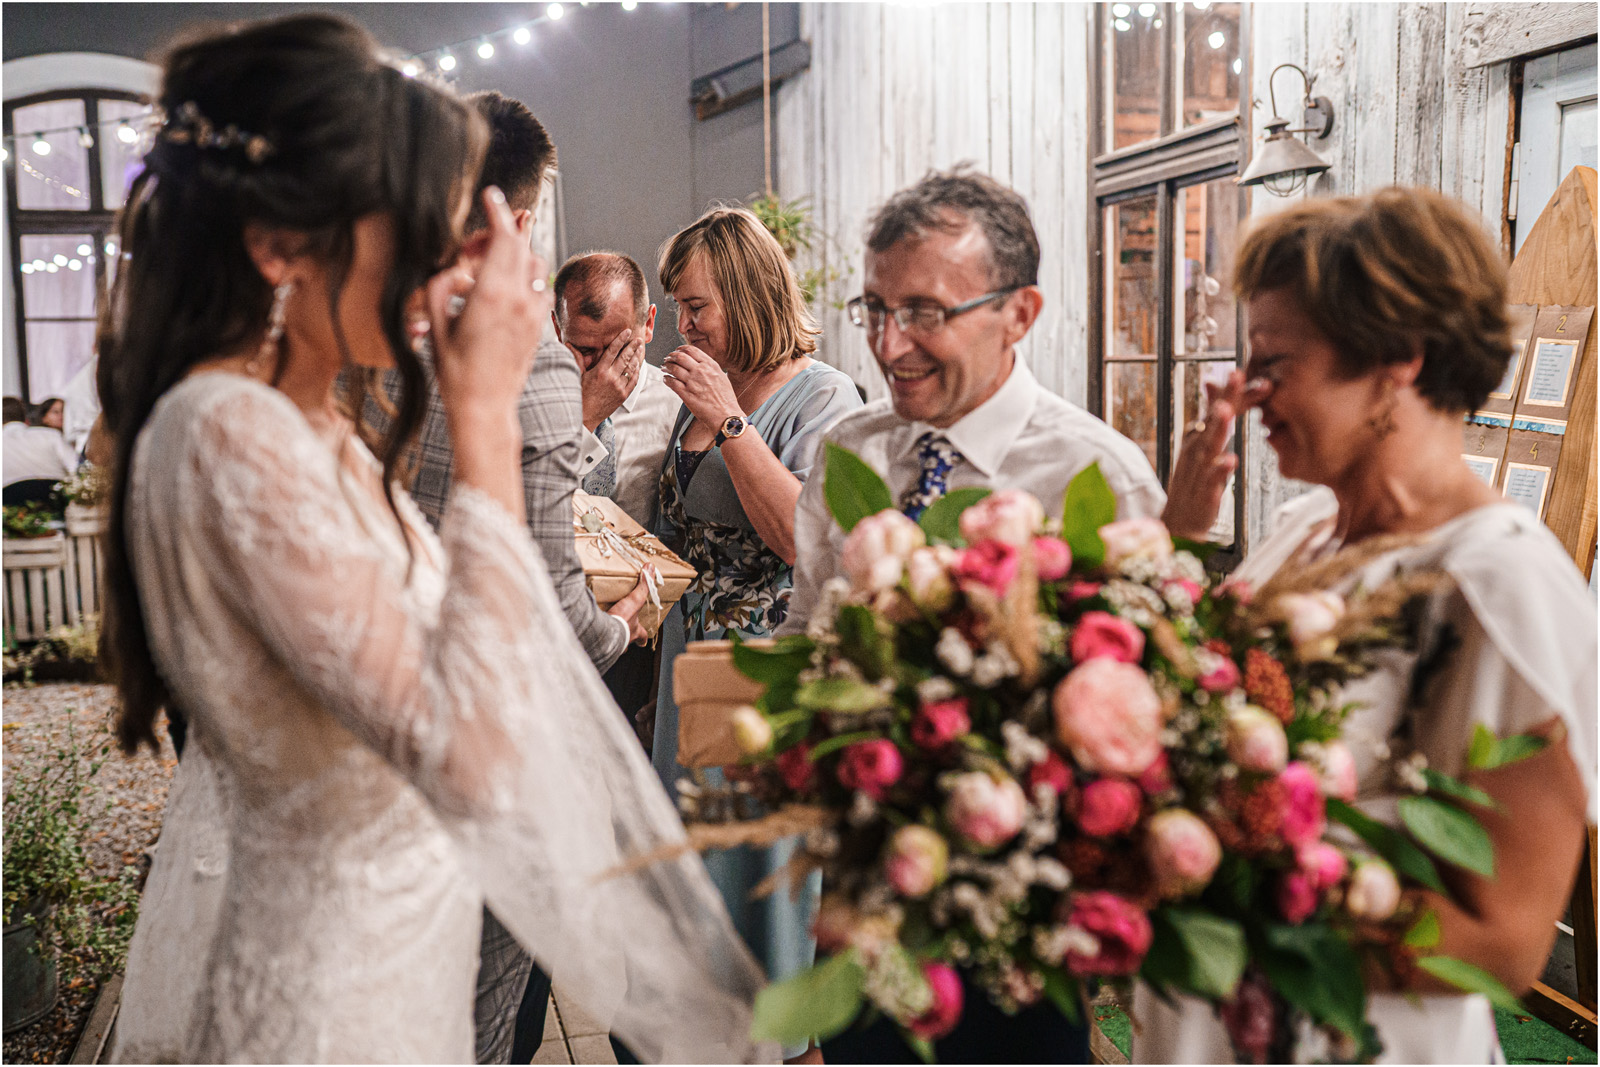 Ania & Mateusz | boho wesele w Stodole pod Kasztanami 137